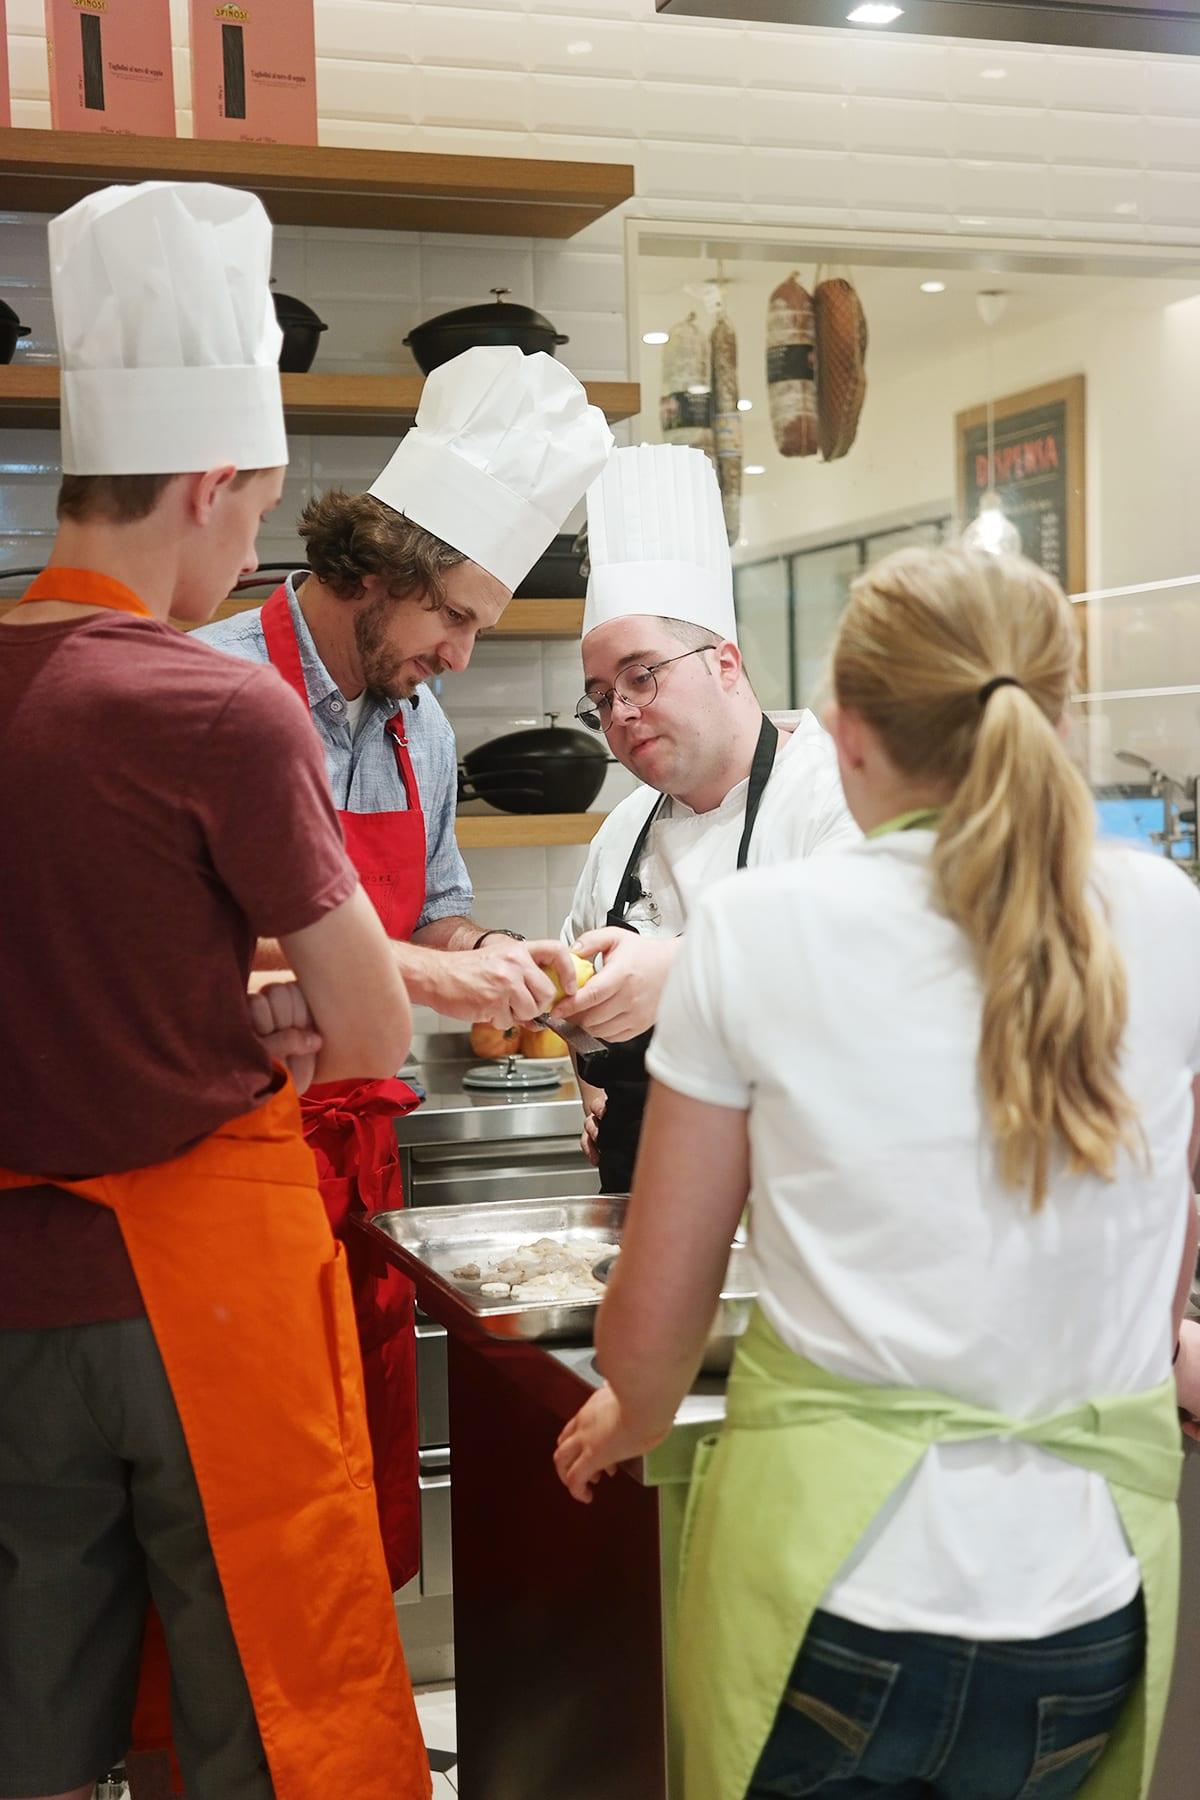 Sapori cooking school 6